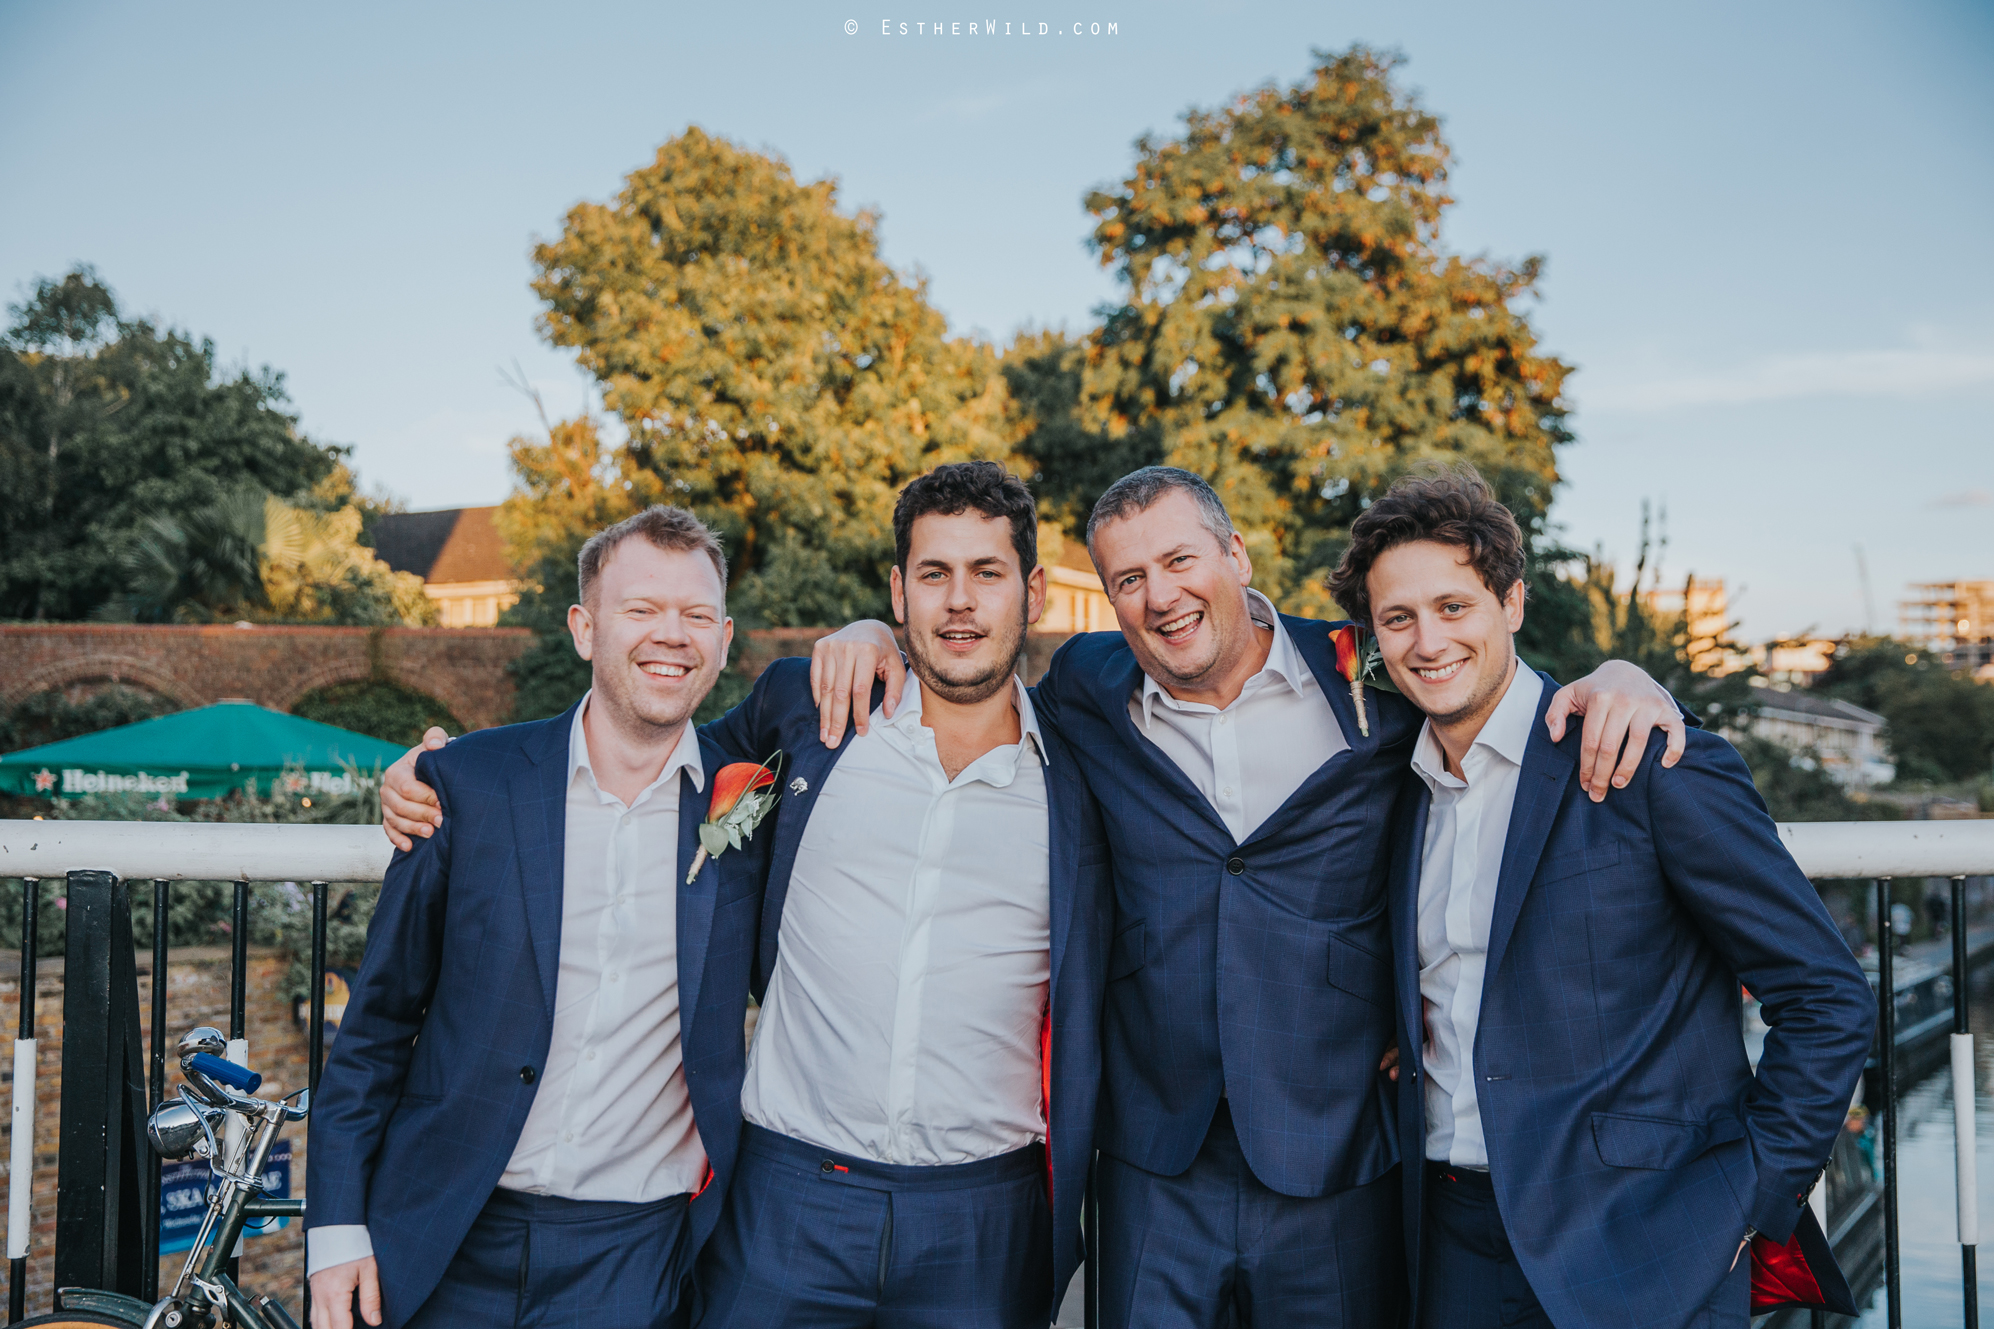 Islington_Town_Hall_Wedding_London_Photographer_Esther_Wild_IMG_7513.jpg